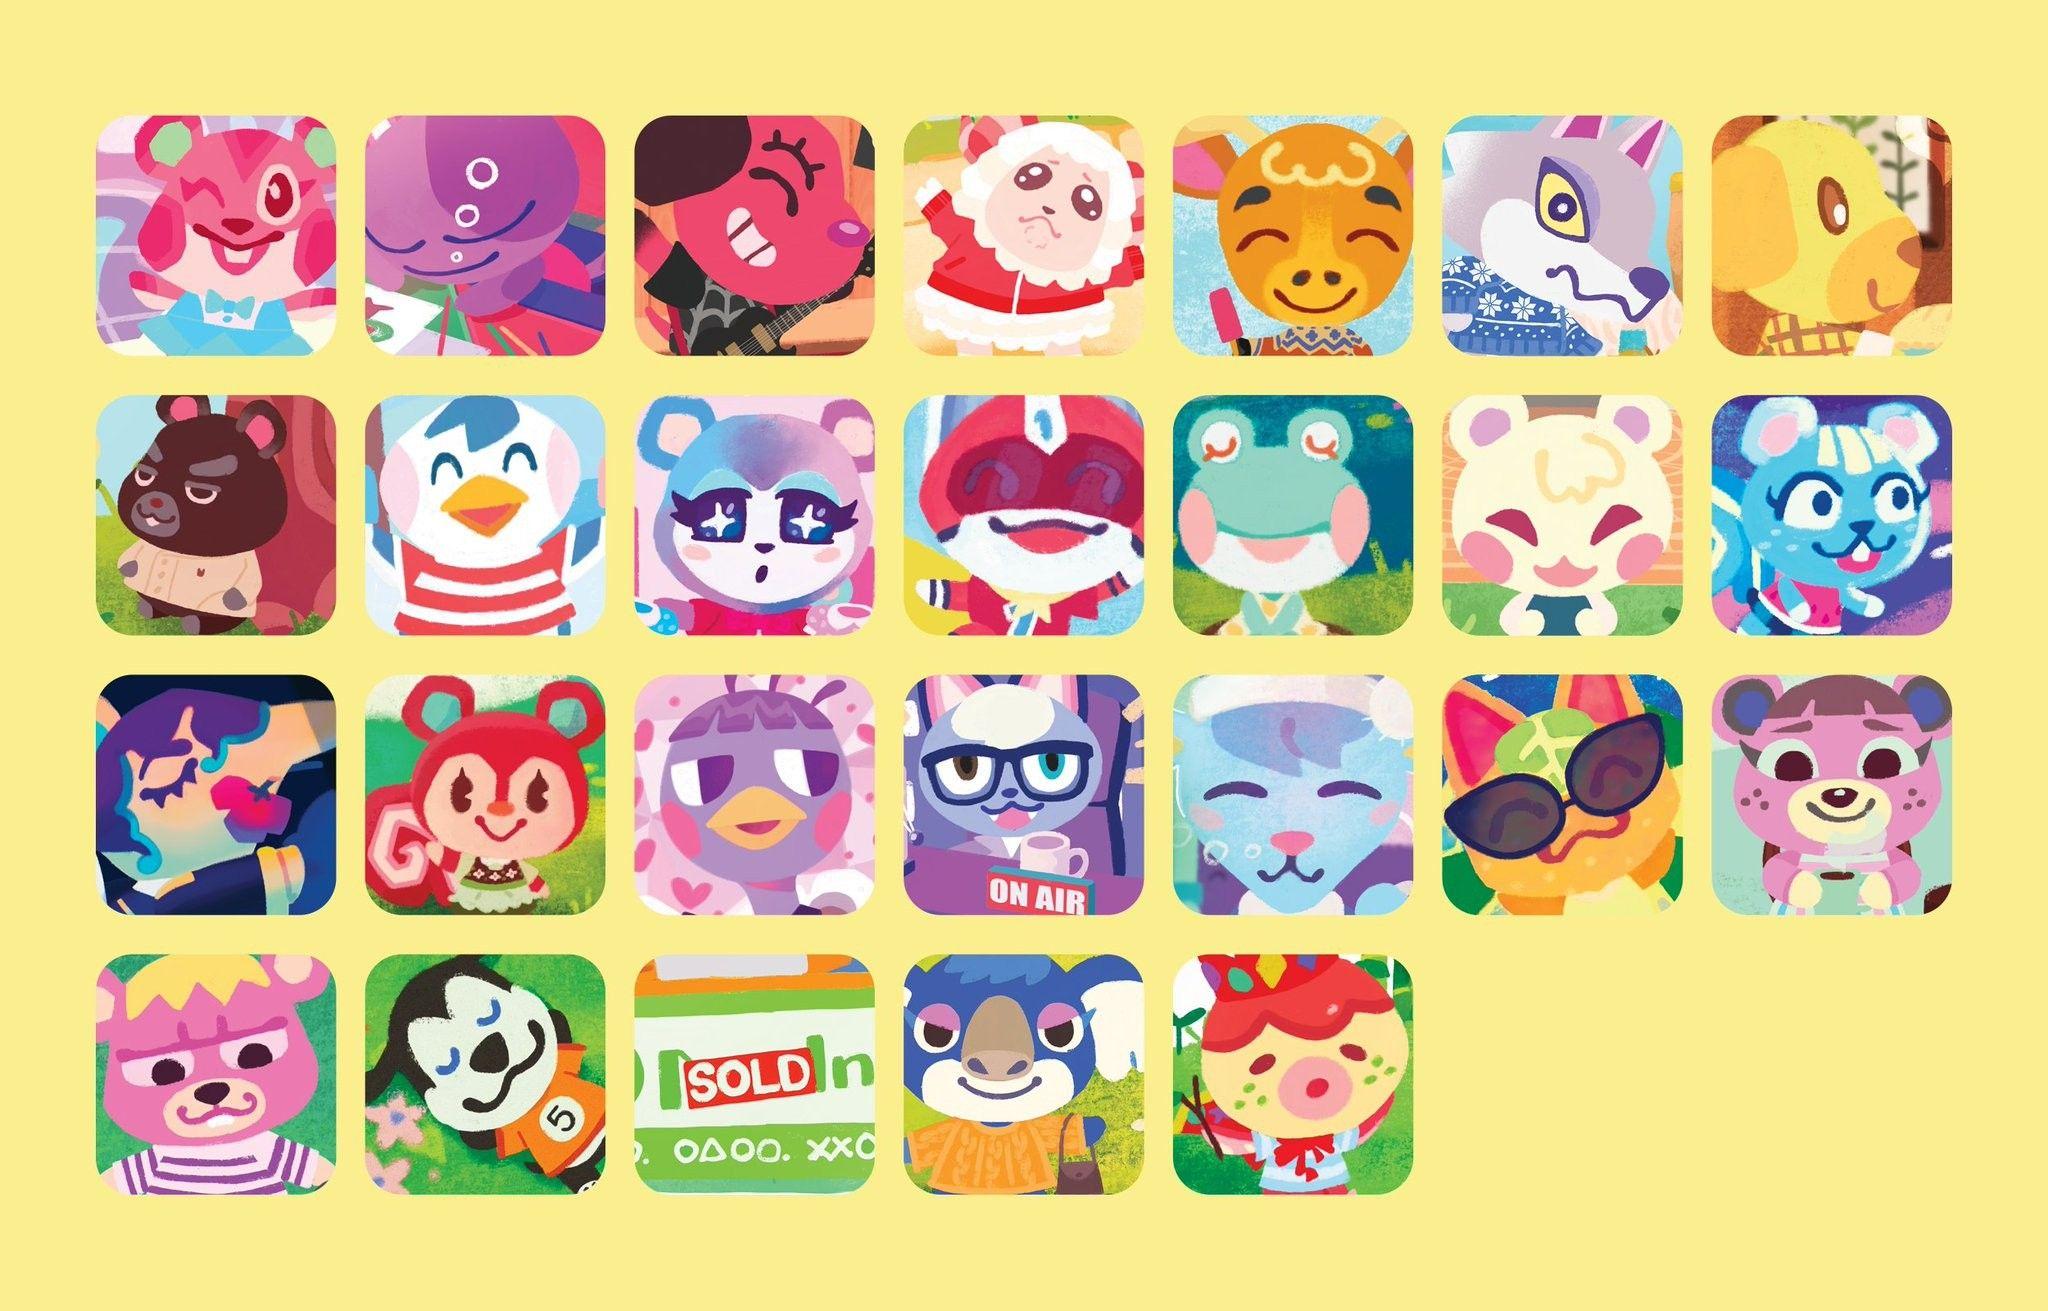 Pin By Juliamae Abarintos On Animal Crossing Animal Crossing Fan Art Animal Crossing Villagers Animal Crossing